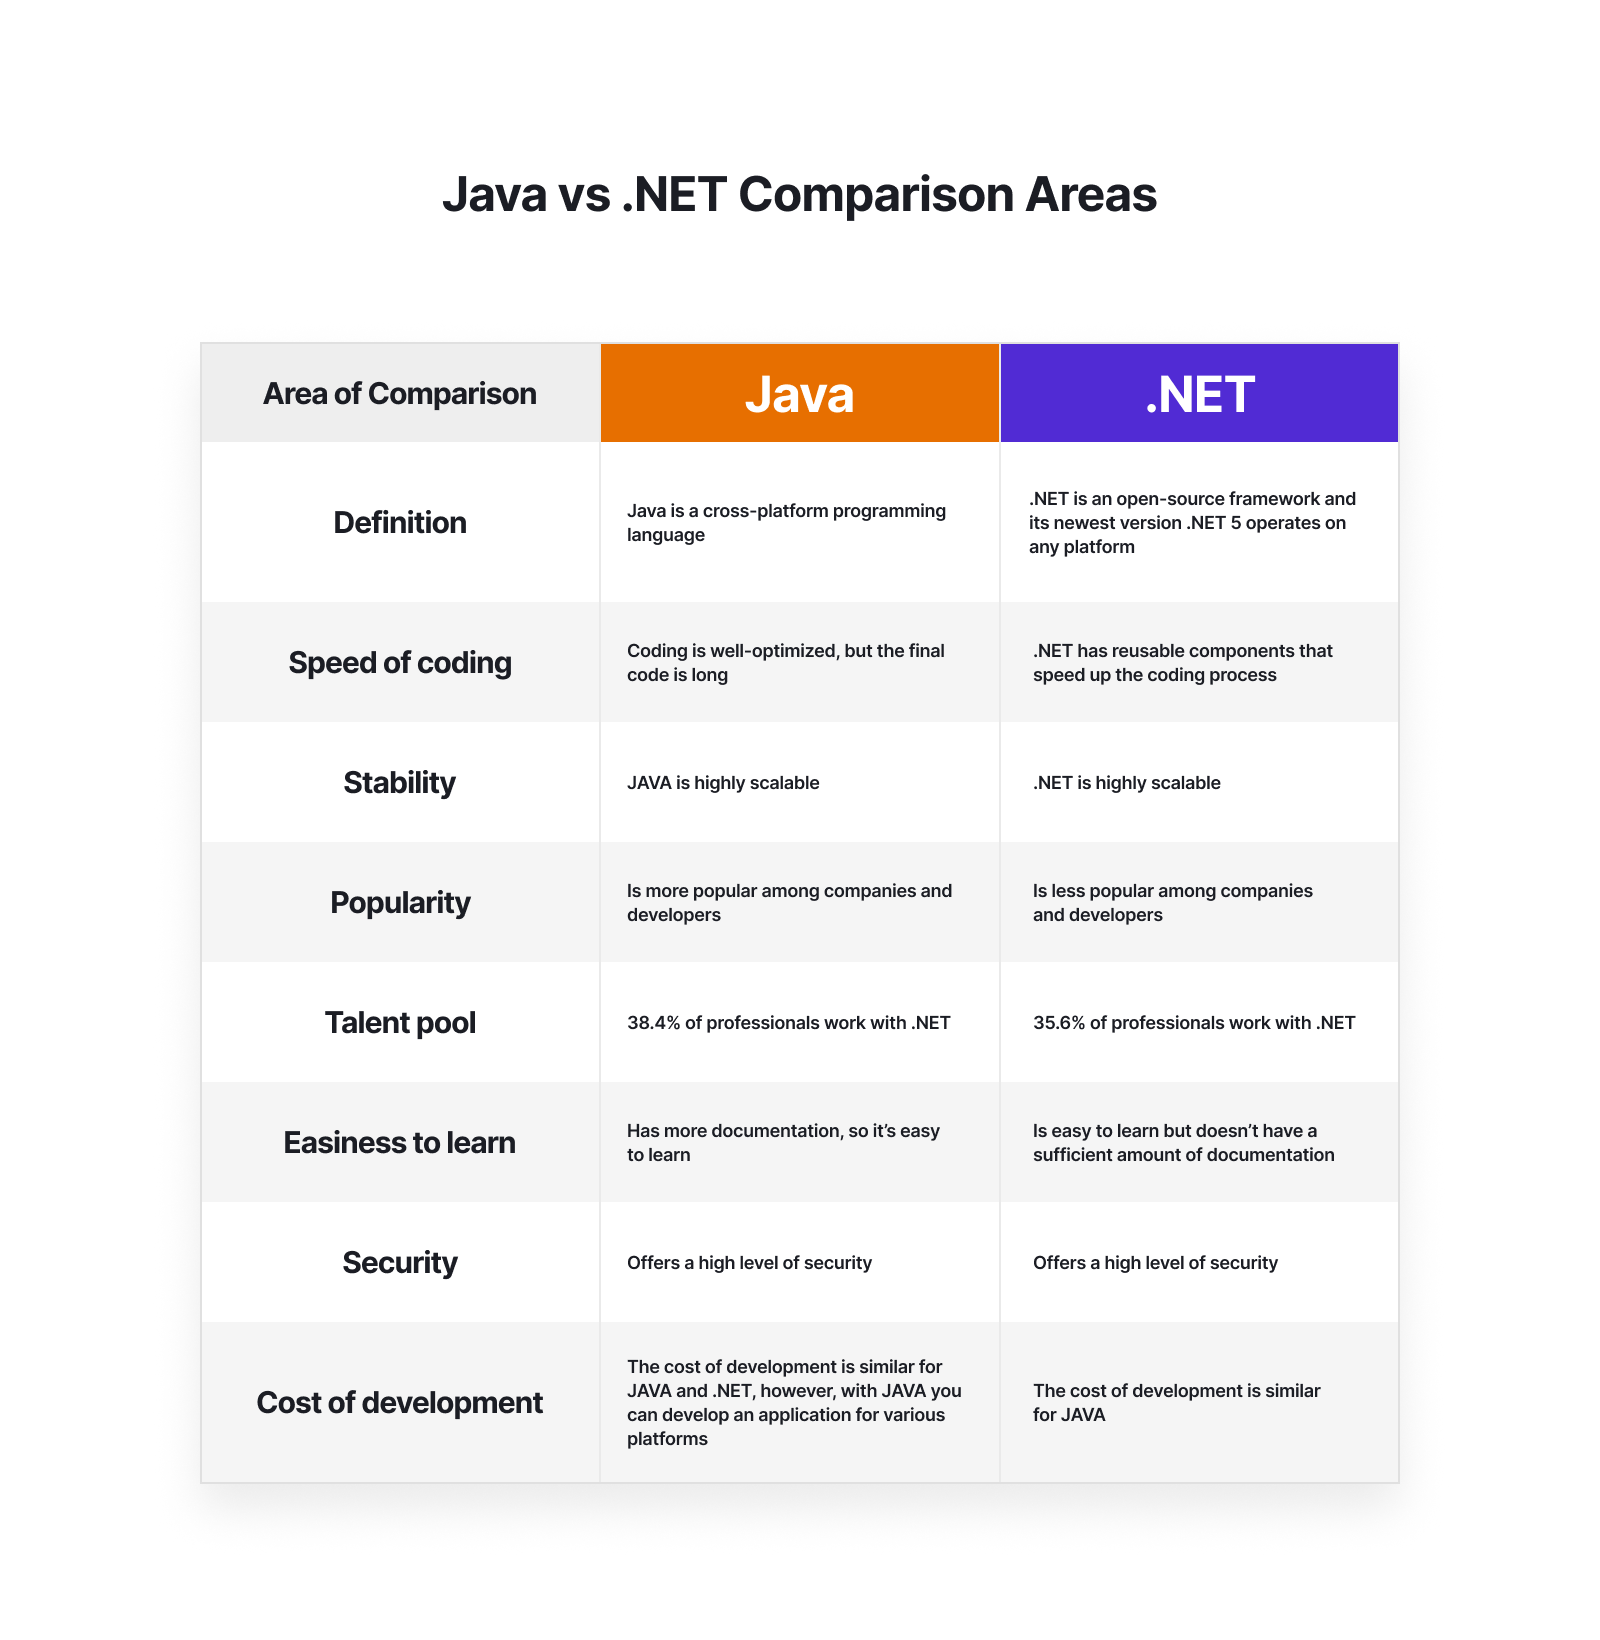 .NET vs JAVA Comparison Areas